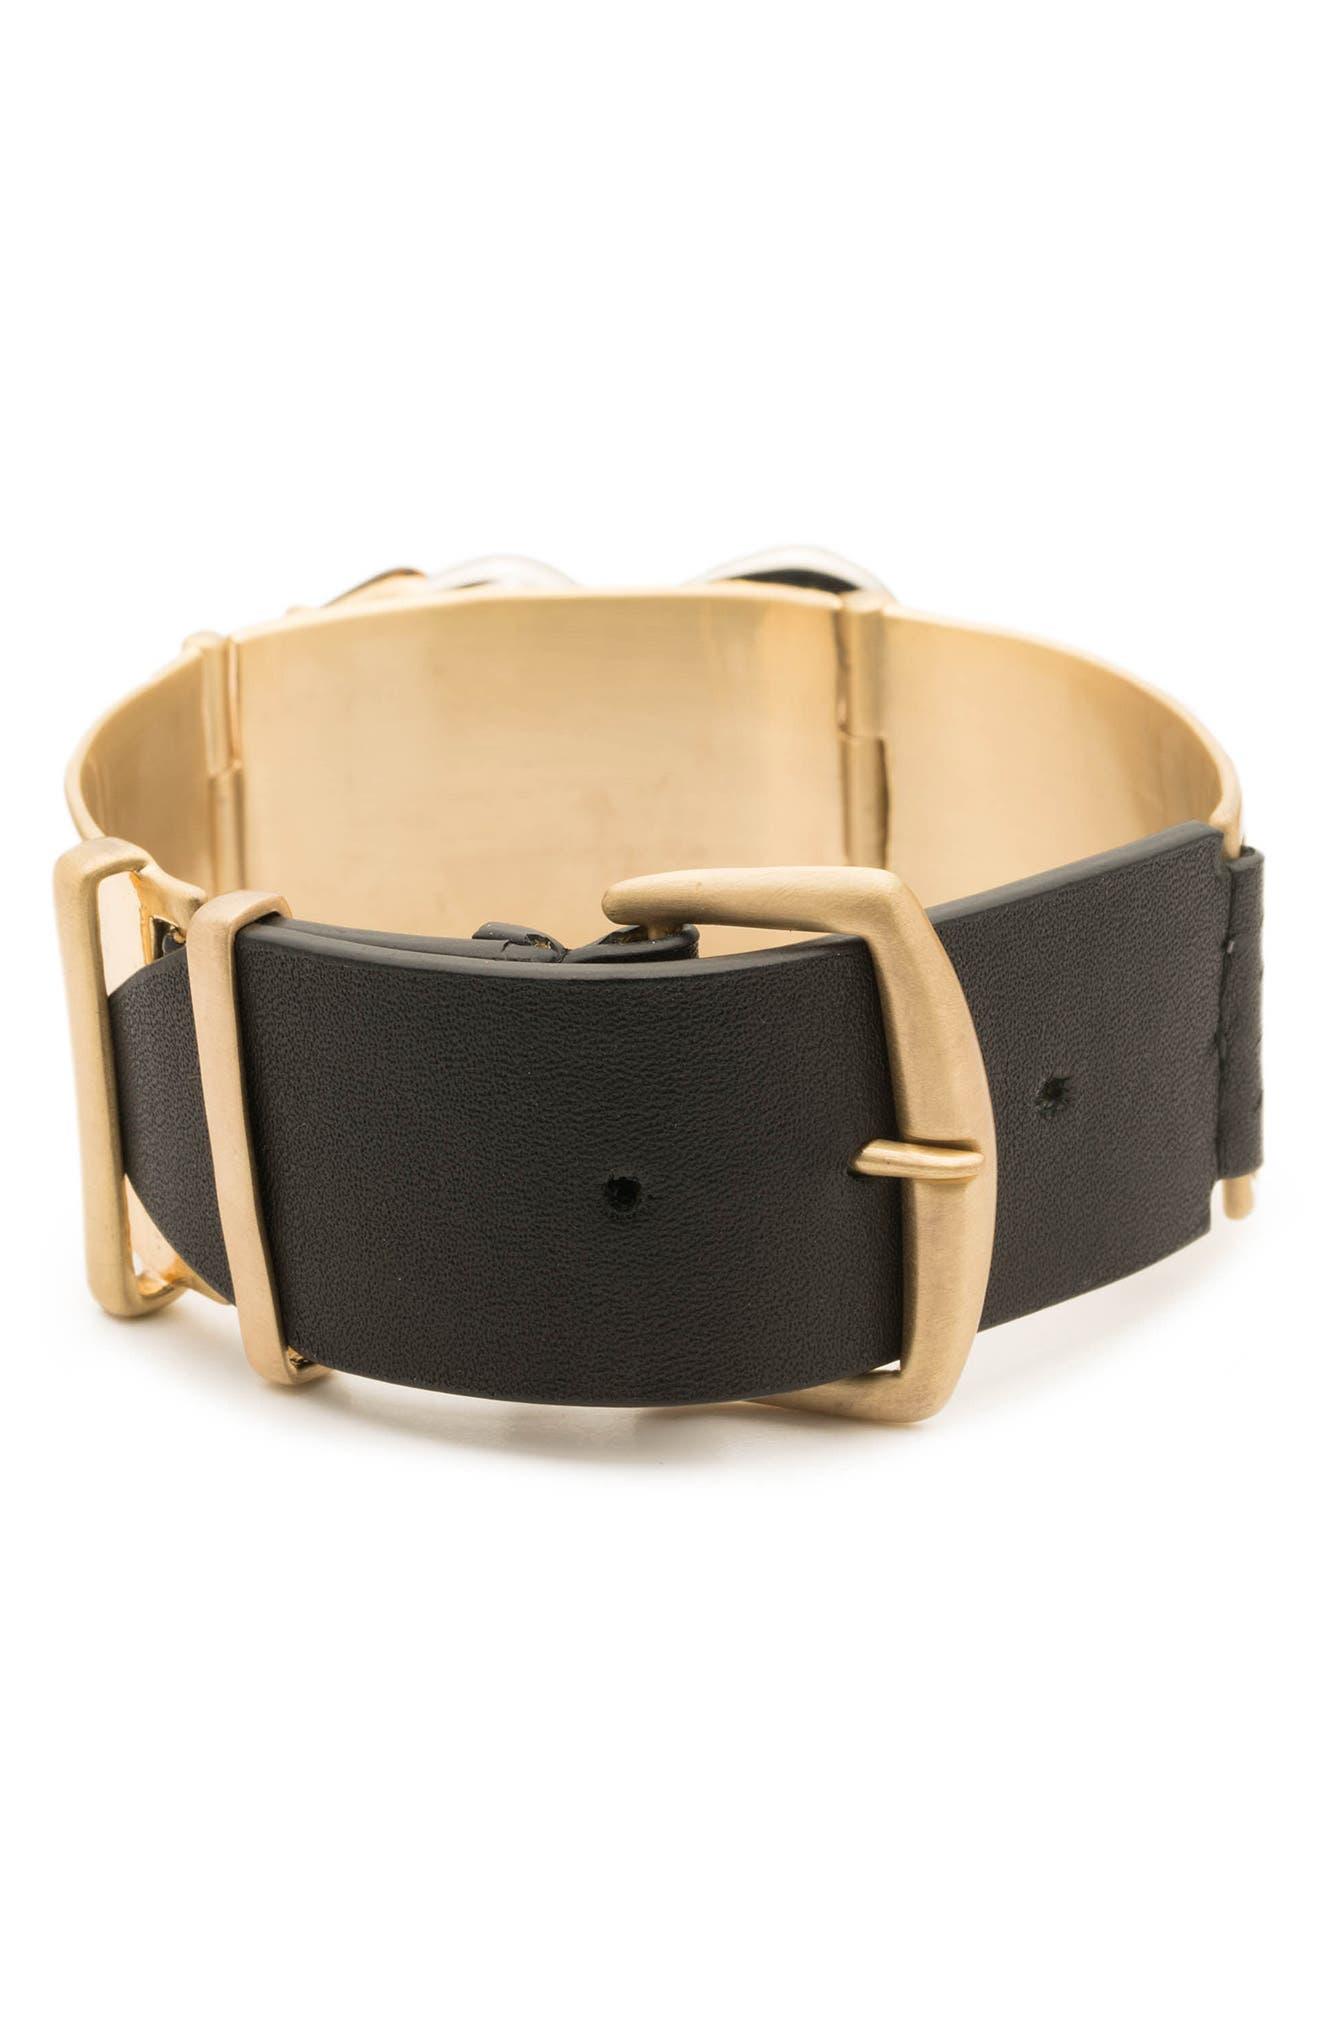 Crystal Encrusted Leather Strap Bracelet,                             Alternate thumbnail 3, color,                             GOLD/ SILVER